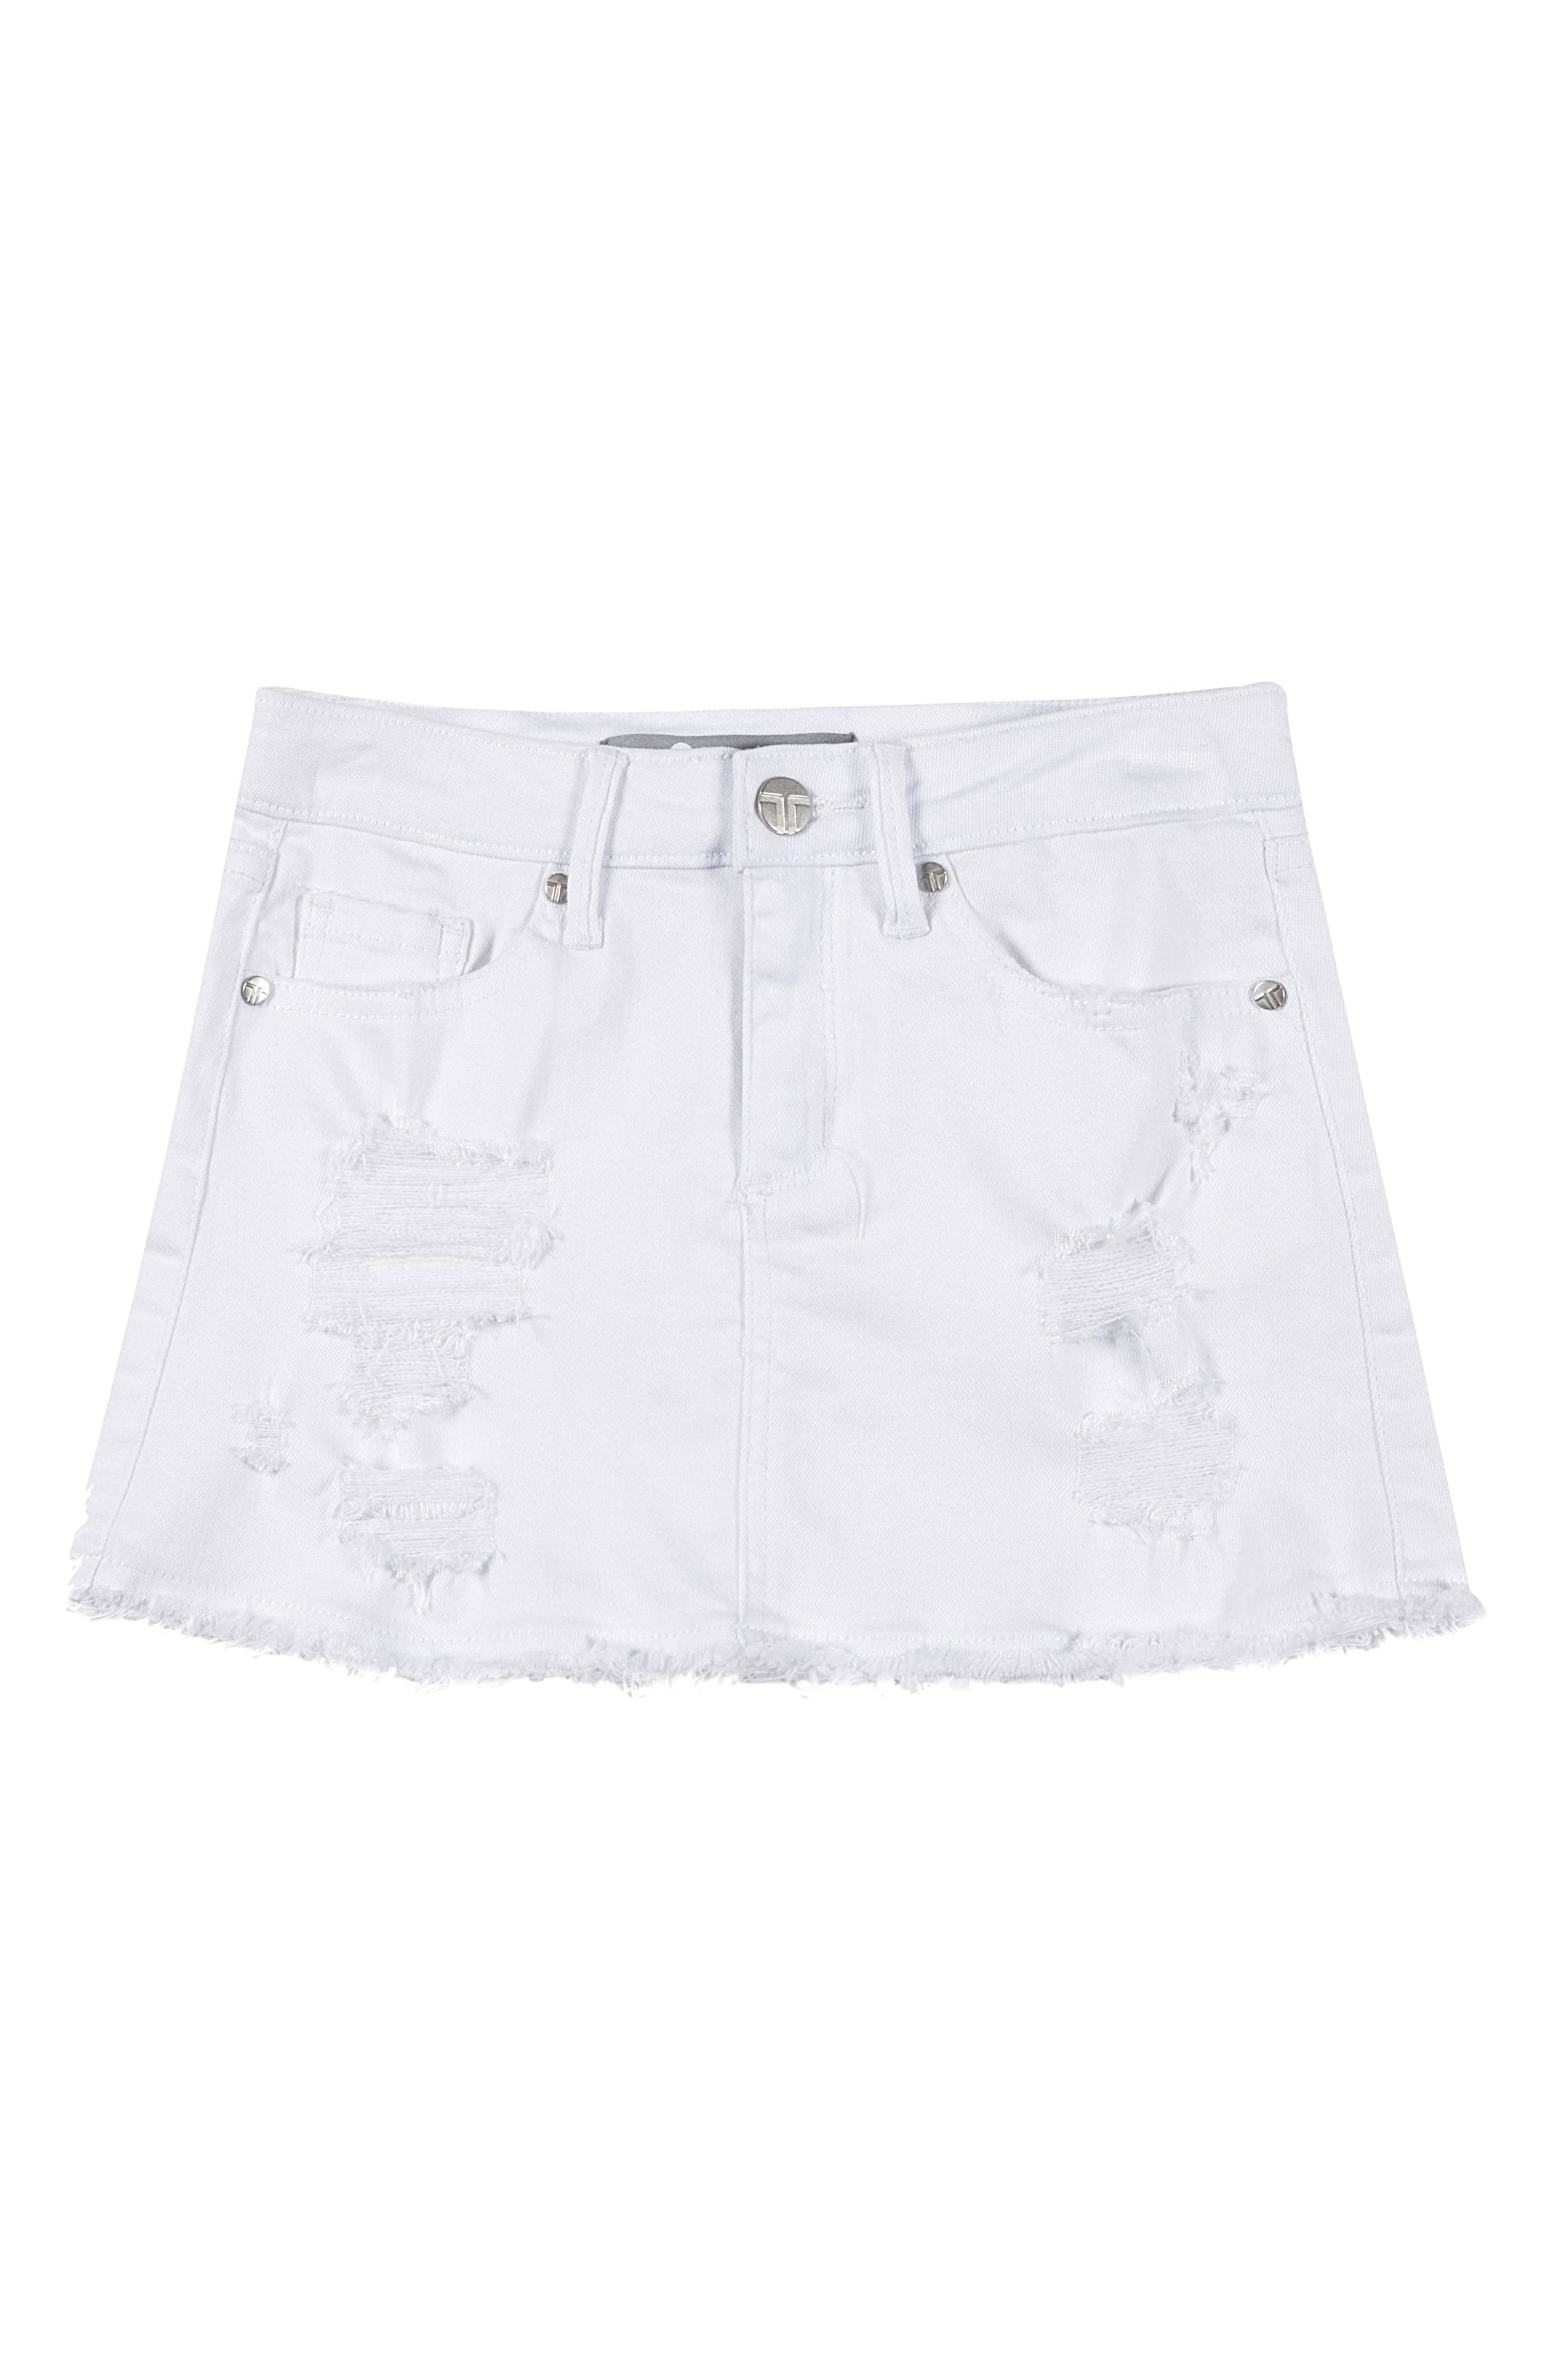 Tractr Distressed Denim Skirt (Big Girls)